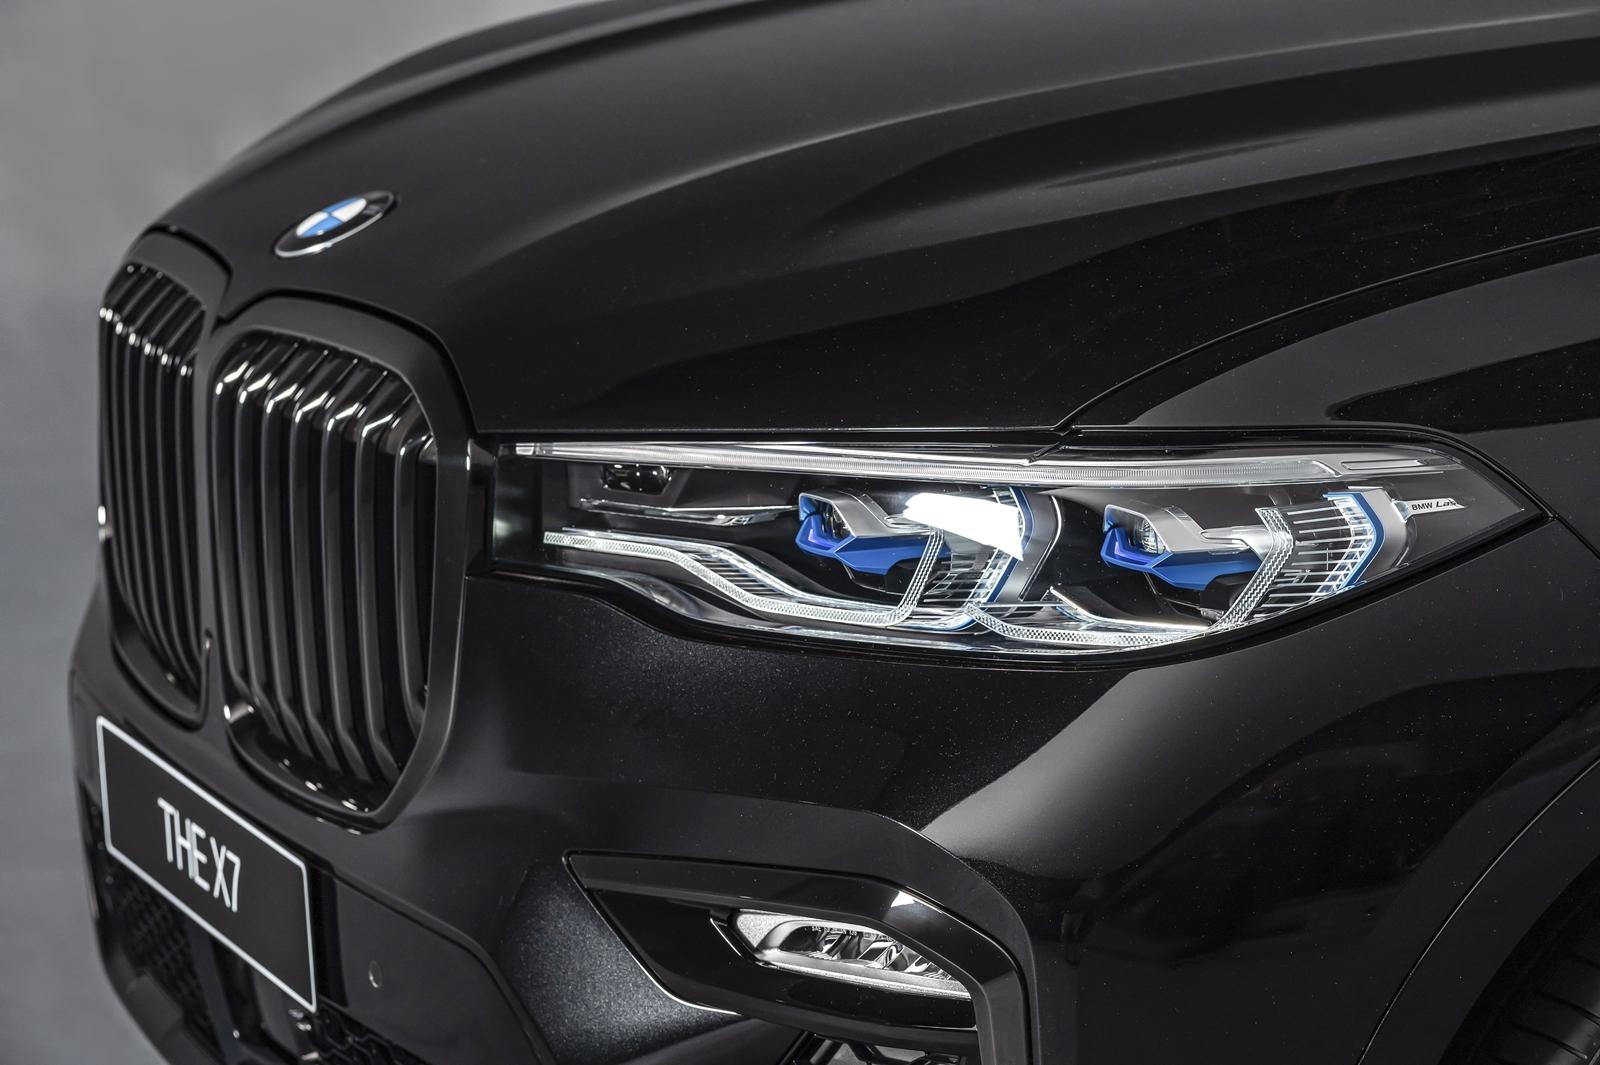 BMW X7 Dark Knight曜黑版升級智慧雷射頭燈(含Glare-free光型變化功能)與黑色高光澤水箱護罩。